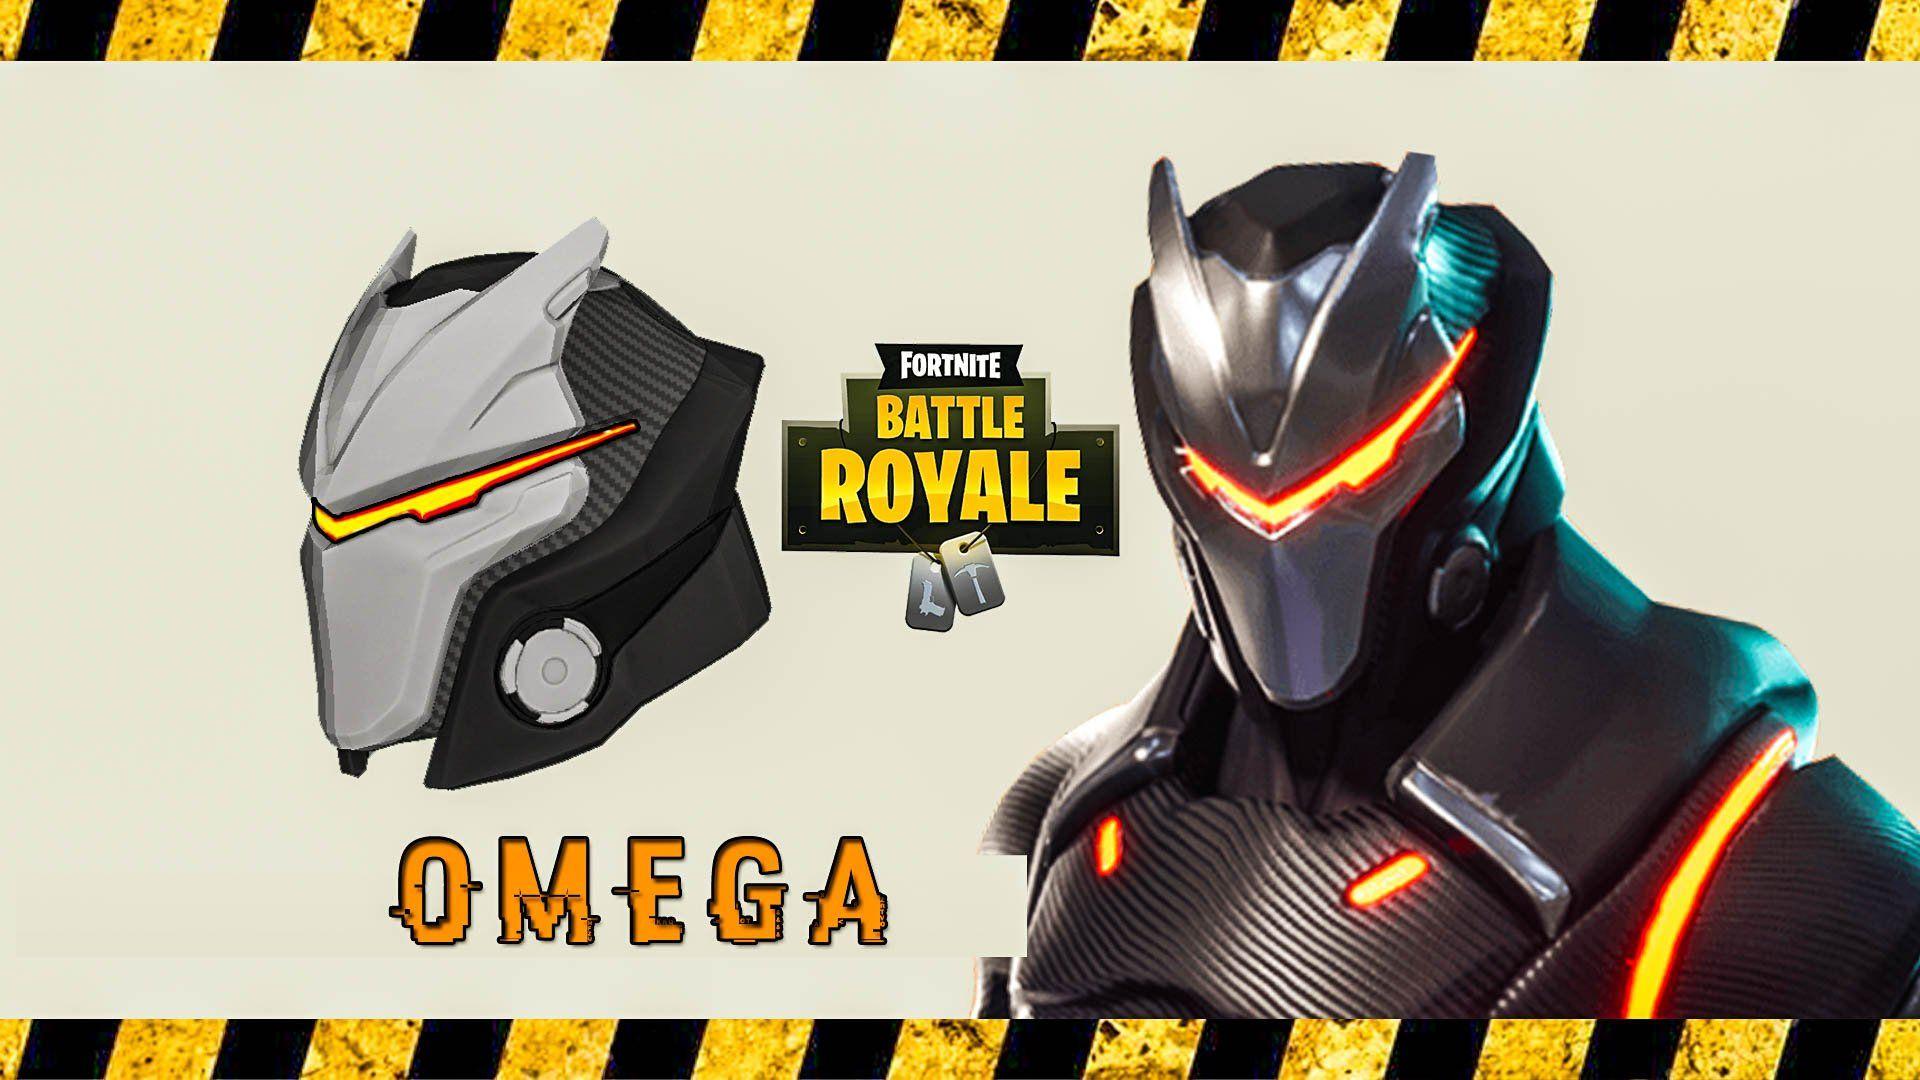 Fortnite Omega Helmet Diy Patterns Fortnite Cosplay Max